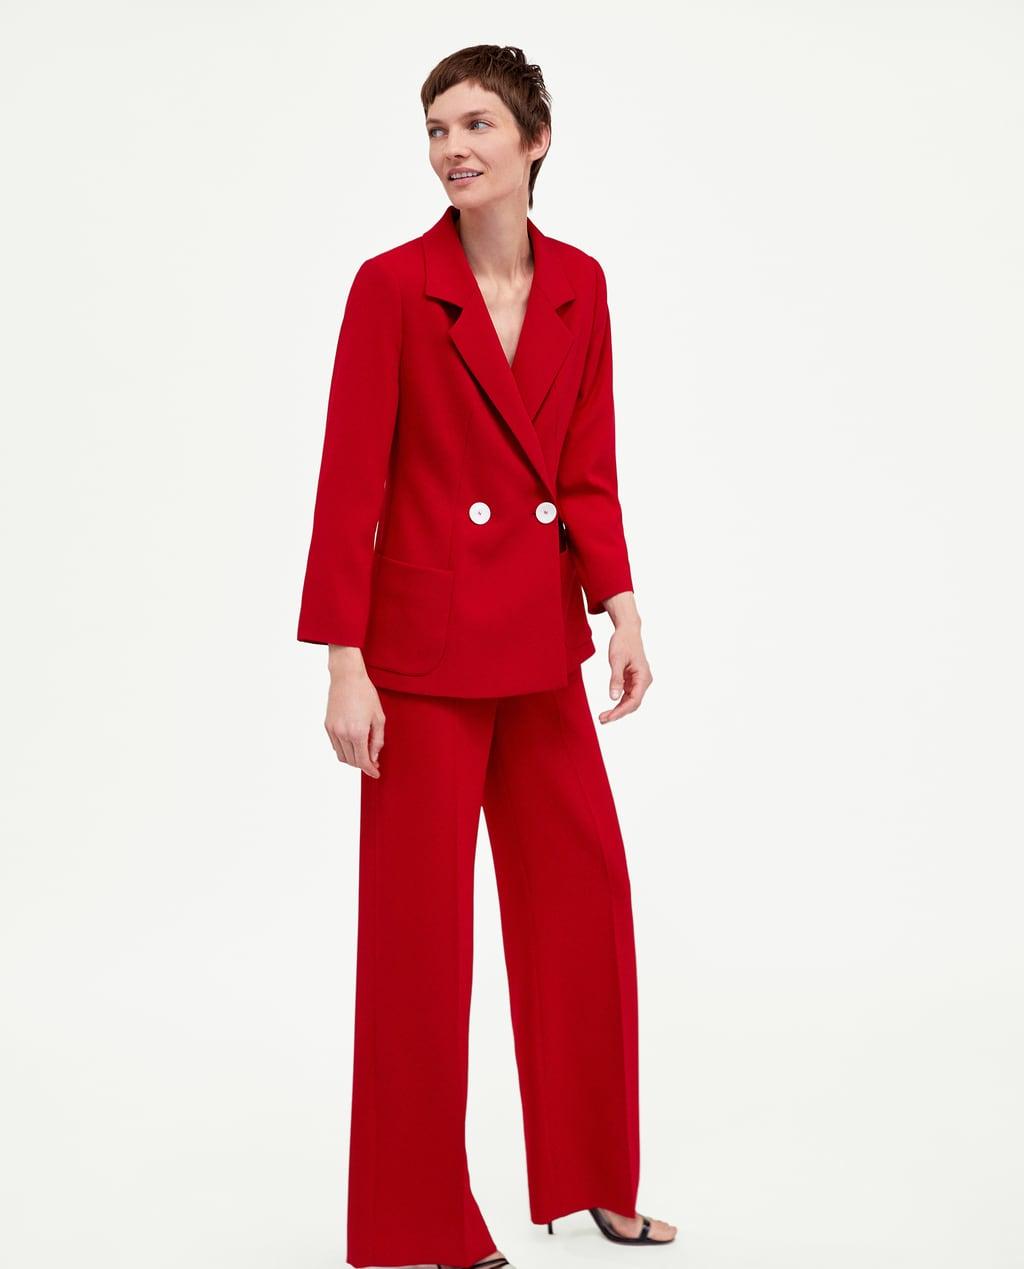 traje chaqueta rojo zara